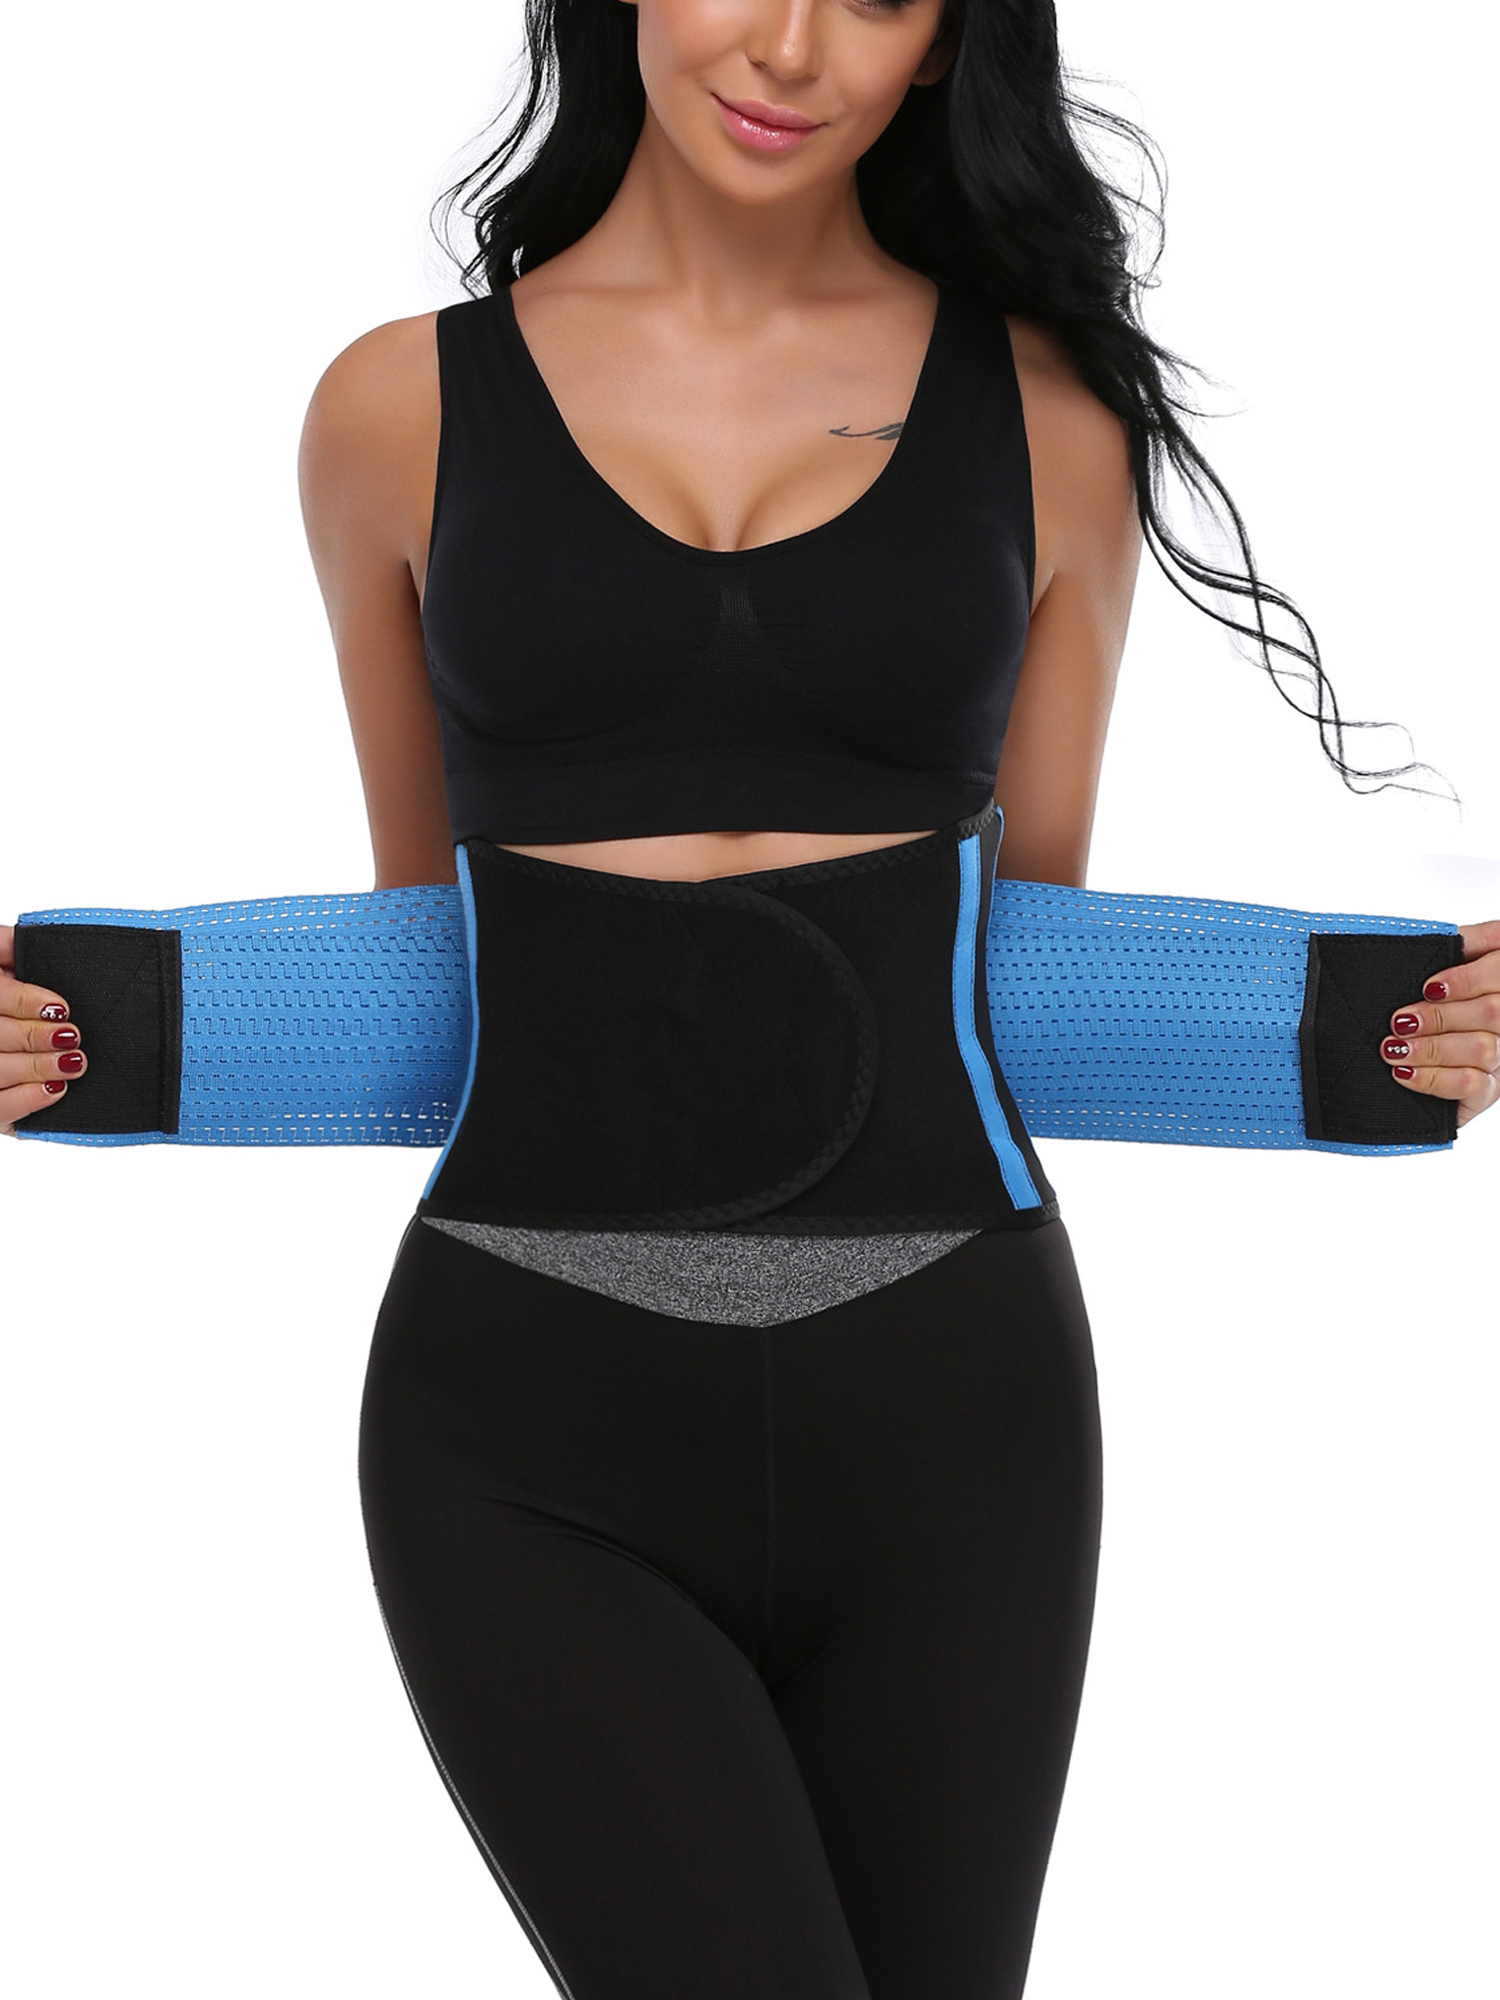 Women Elasticity Sweat Waist Trainer Corset Trimmer Hot Neoprene Belt Body Shaper Slimming